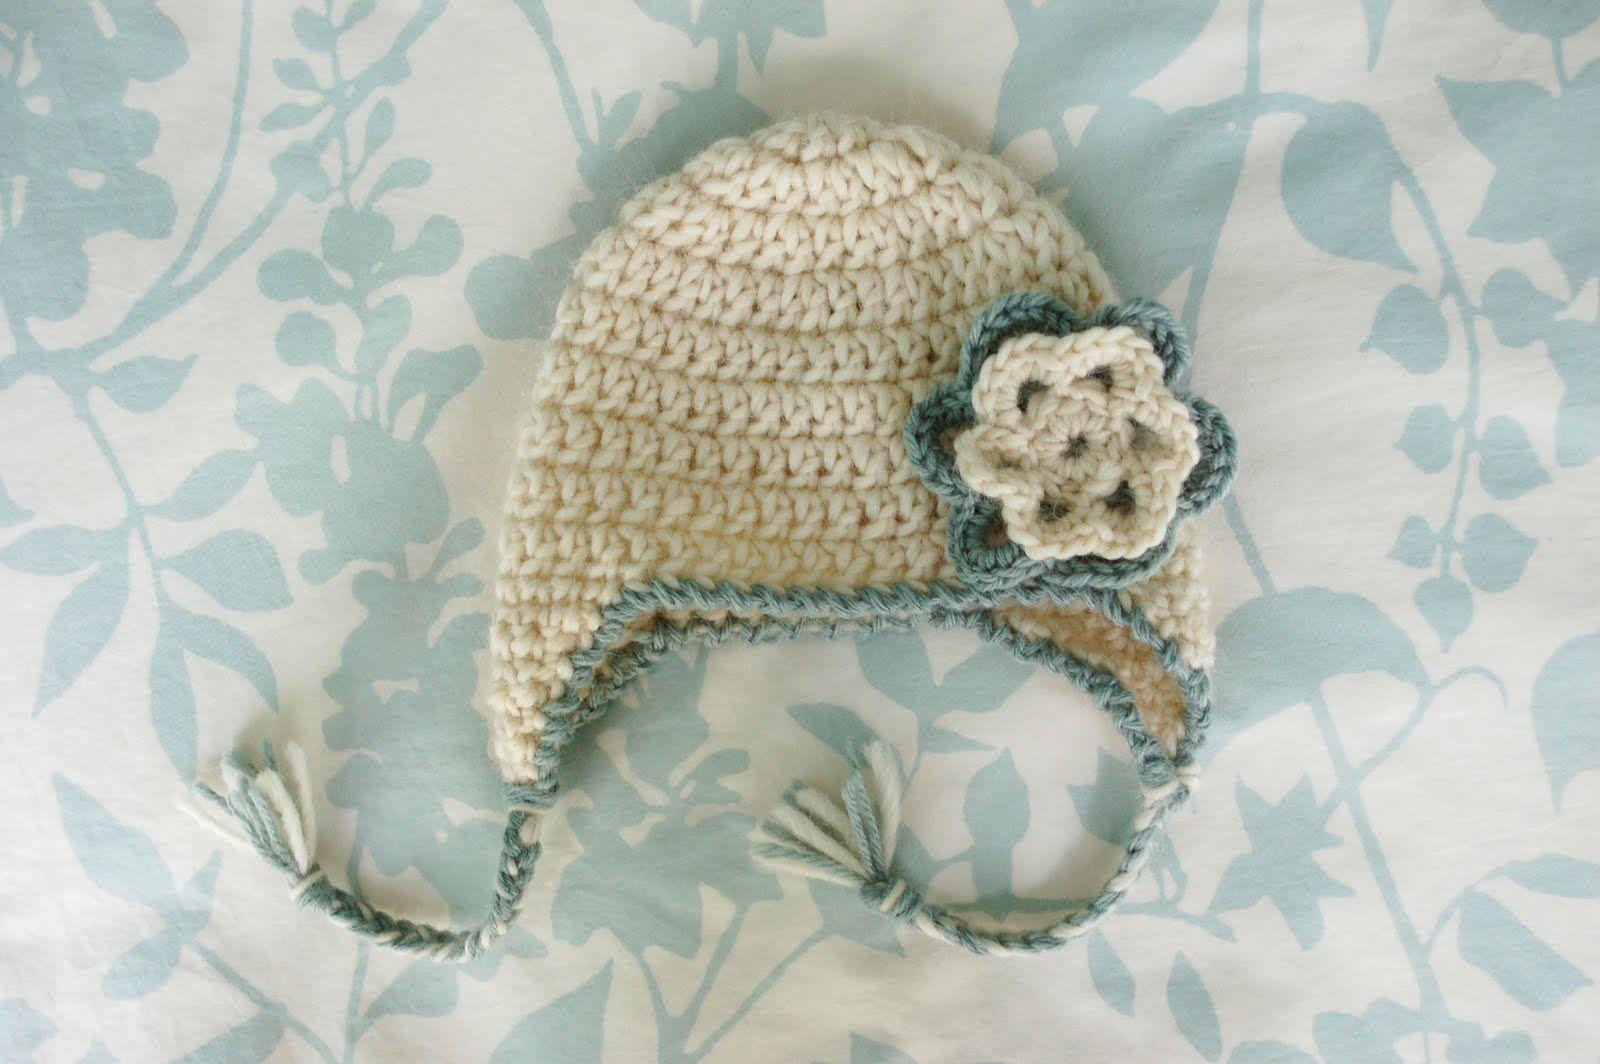 Alli Crafts: Free Crochet Pattern: Baby Earflap Hat - Newborn This ...